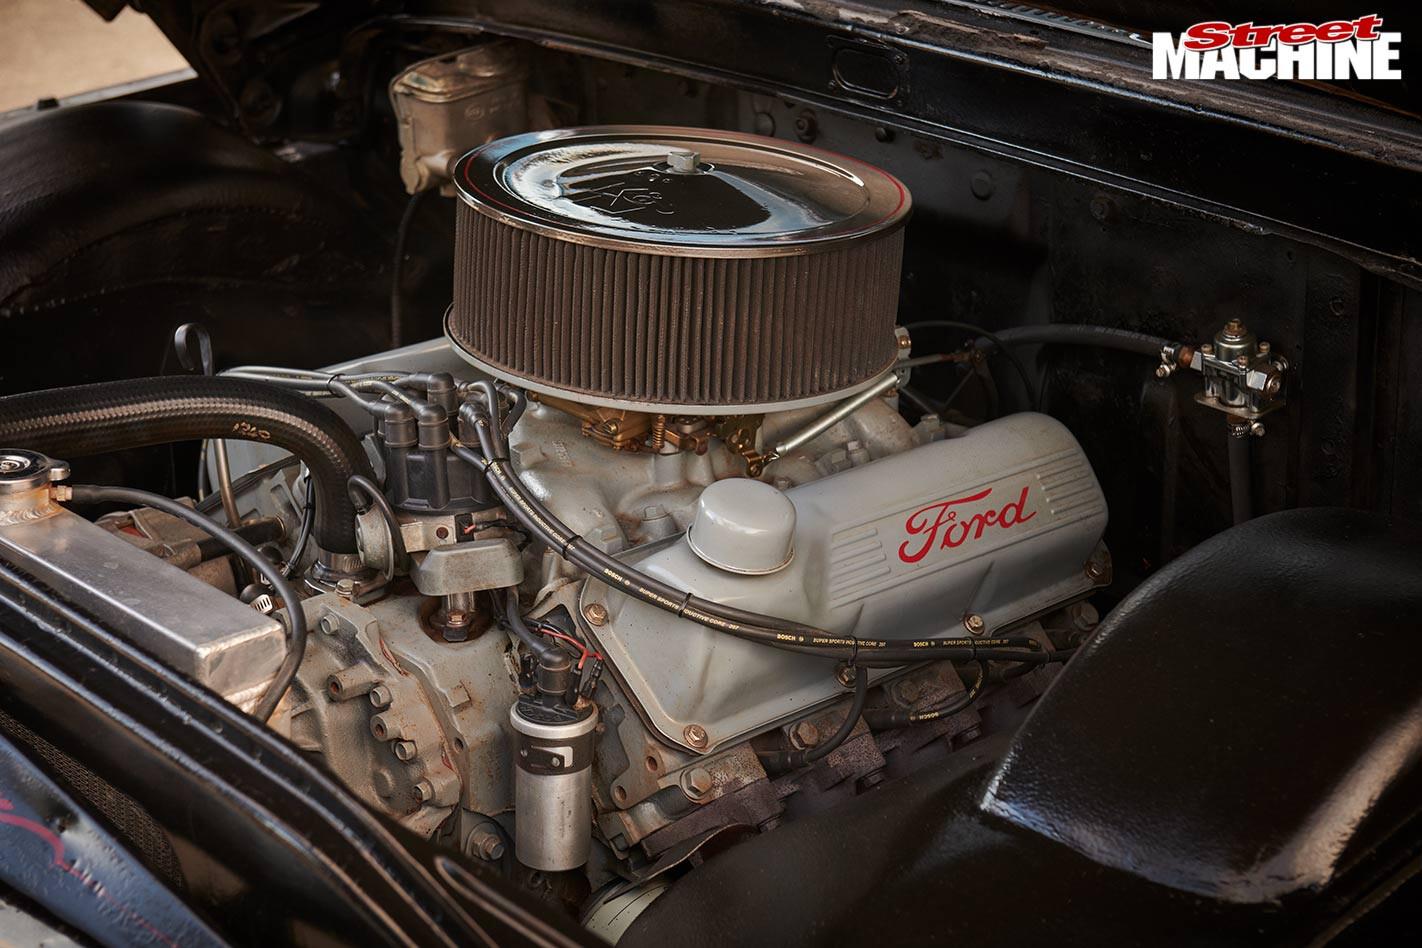 Slammed 1961 Ford F100 engine